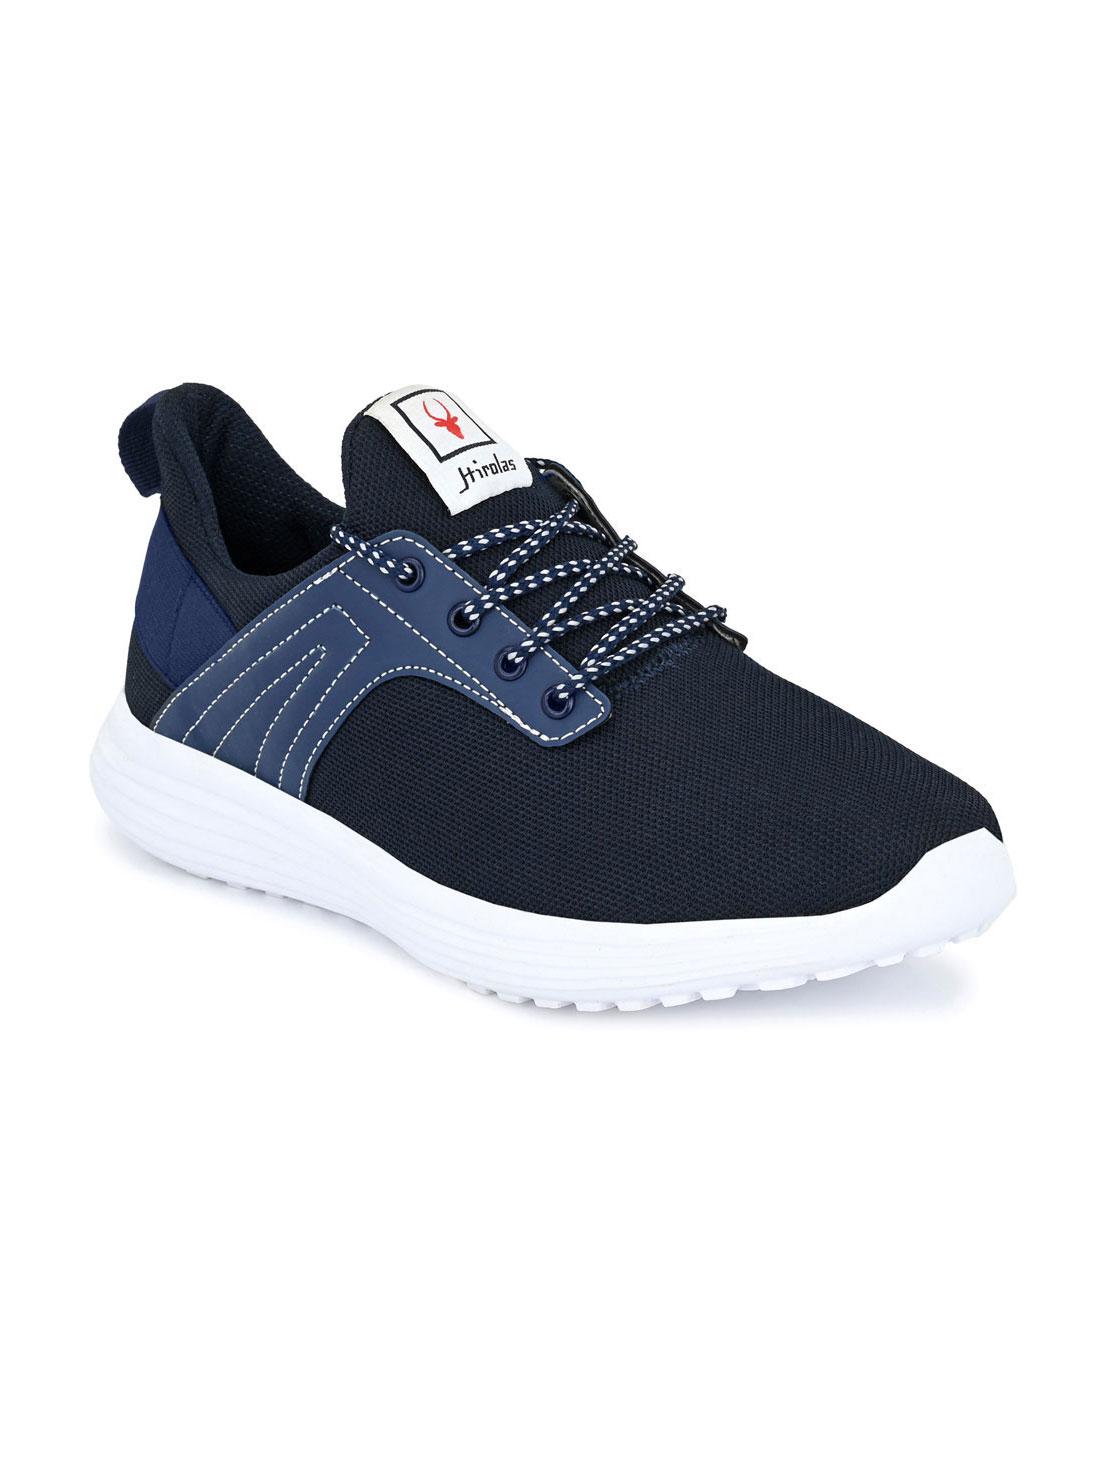 Hirolas | Hirolas® Men's Mesh Blue Running/Walking/Gym Sports Sneaker Shoes